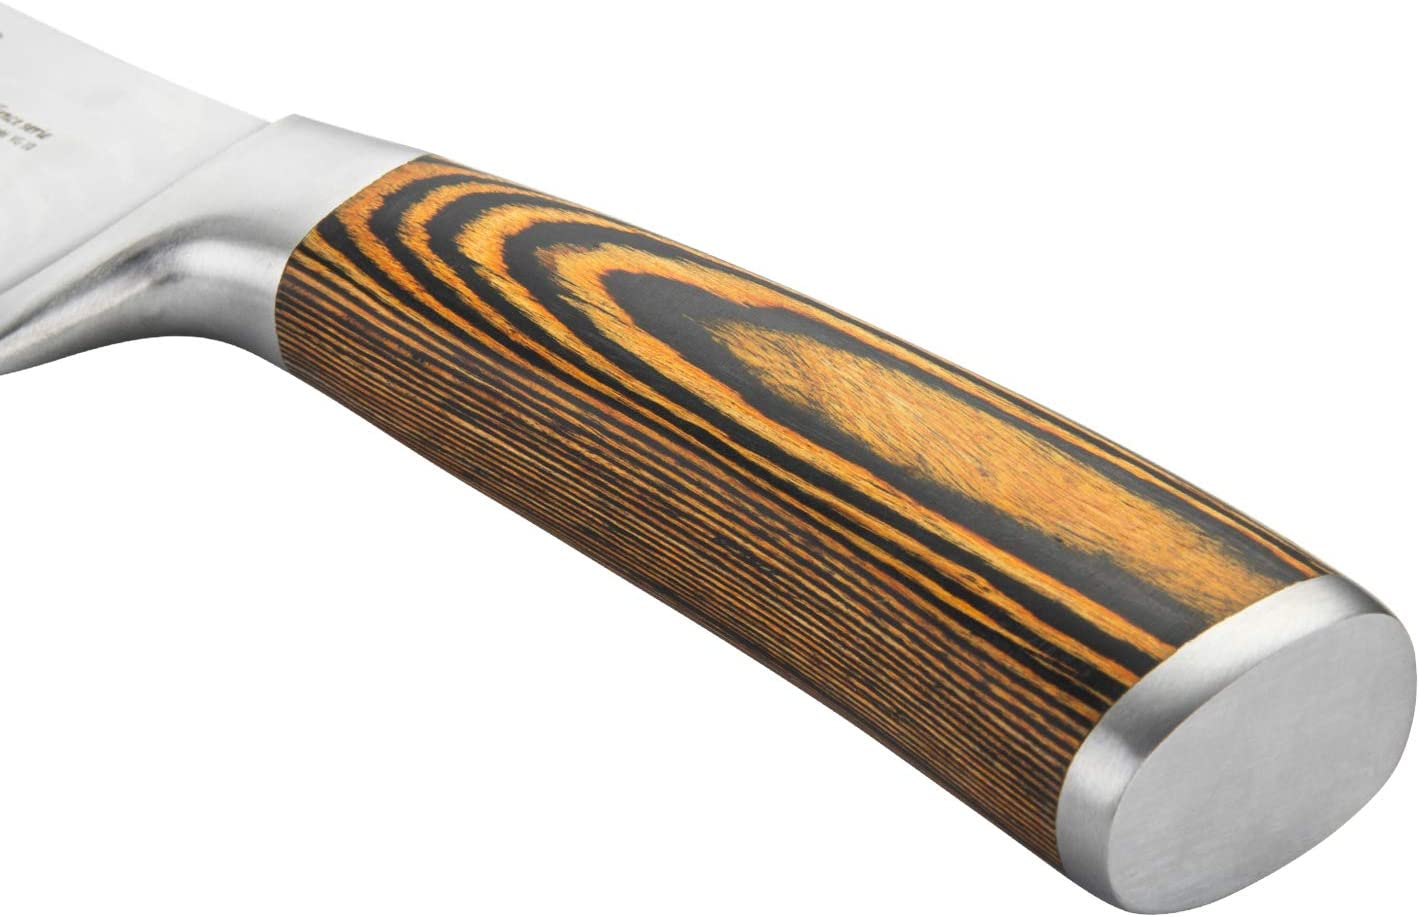 SINLY Damastmesser 20cm-Klinge Profi Japanisches Kochmesser Chefmesser VG-10 67 Lagig Micarta-Handgriff Holzstil